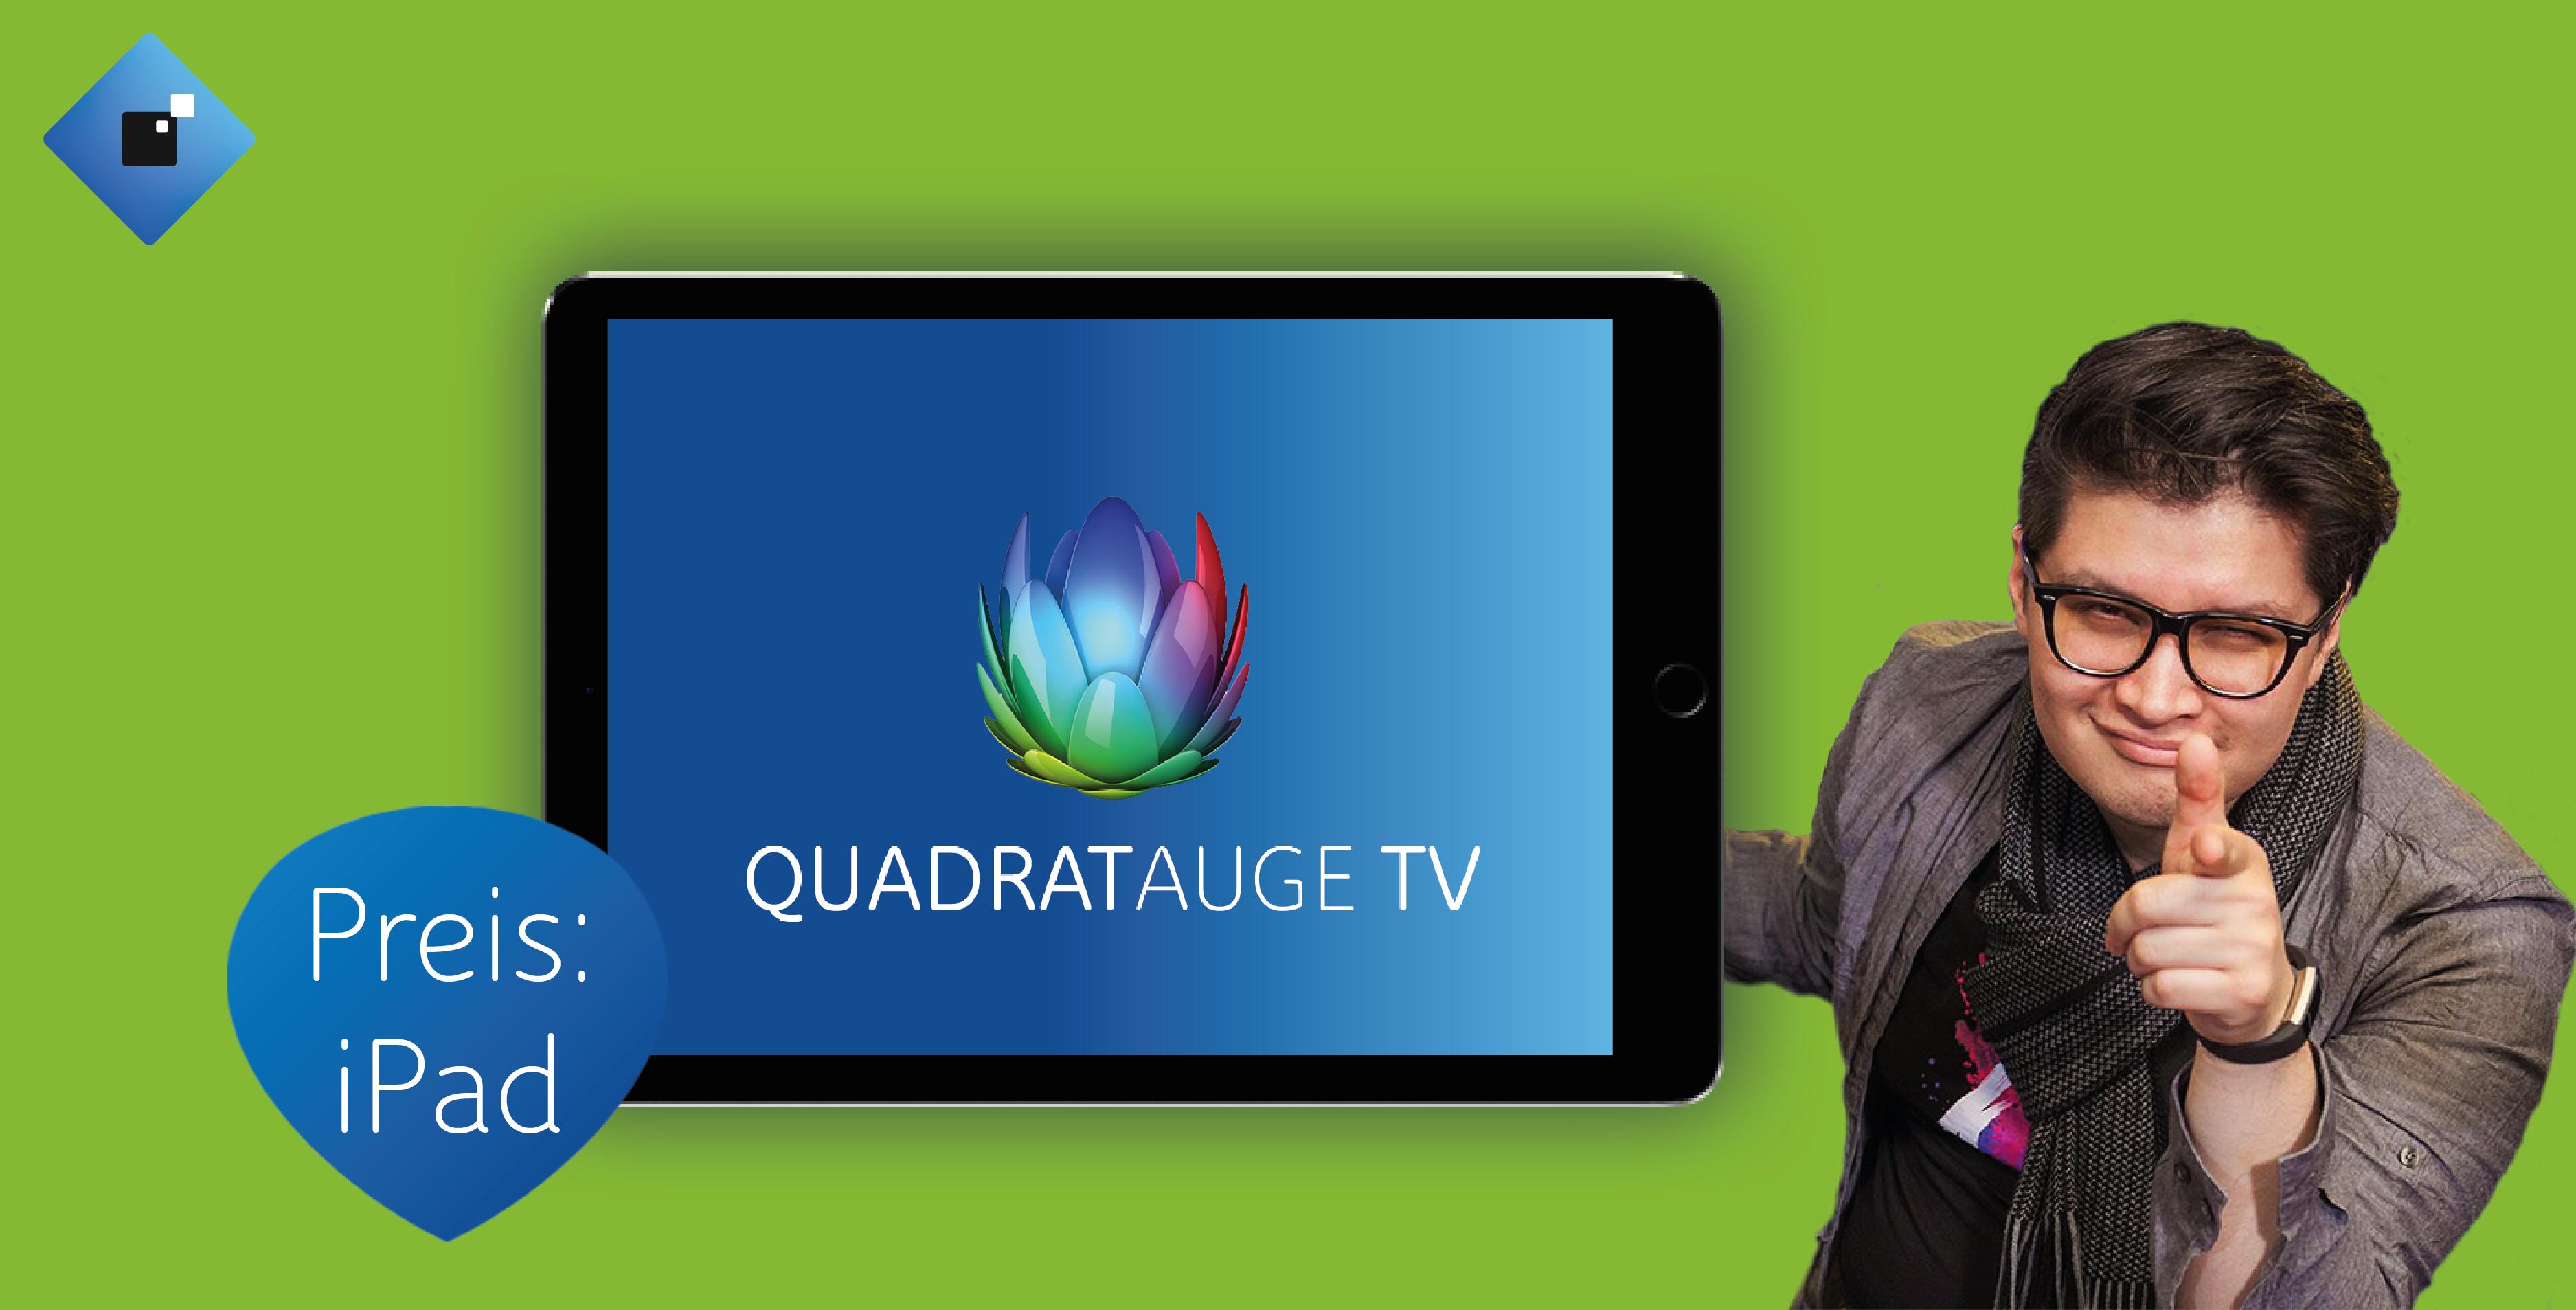 Original_quadratauge-tv-gewinnspiel-01